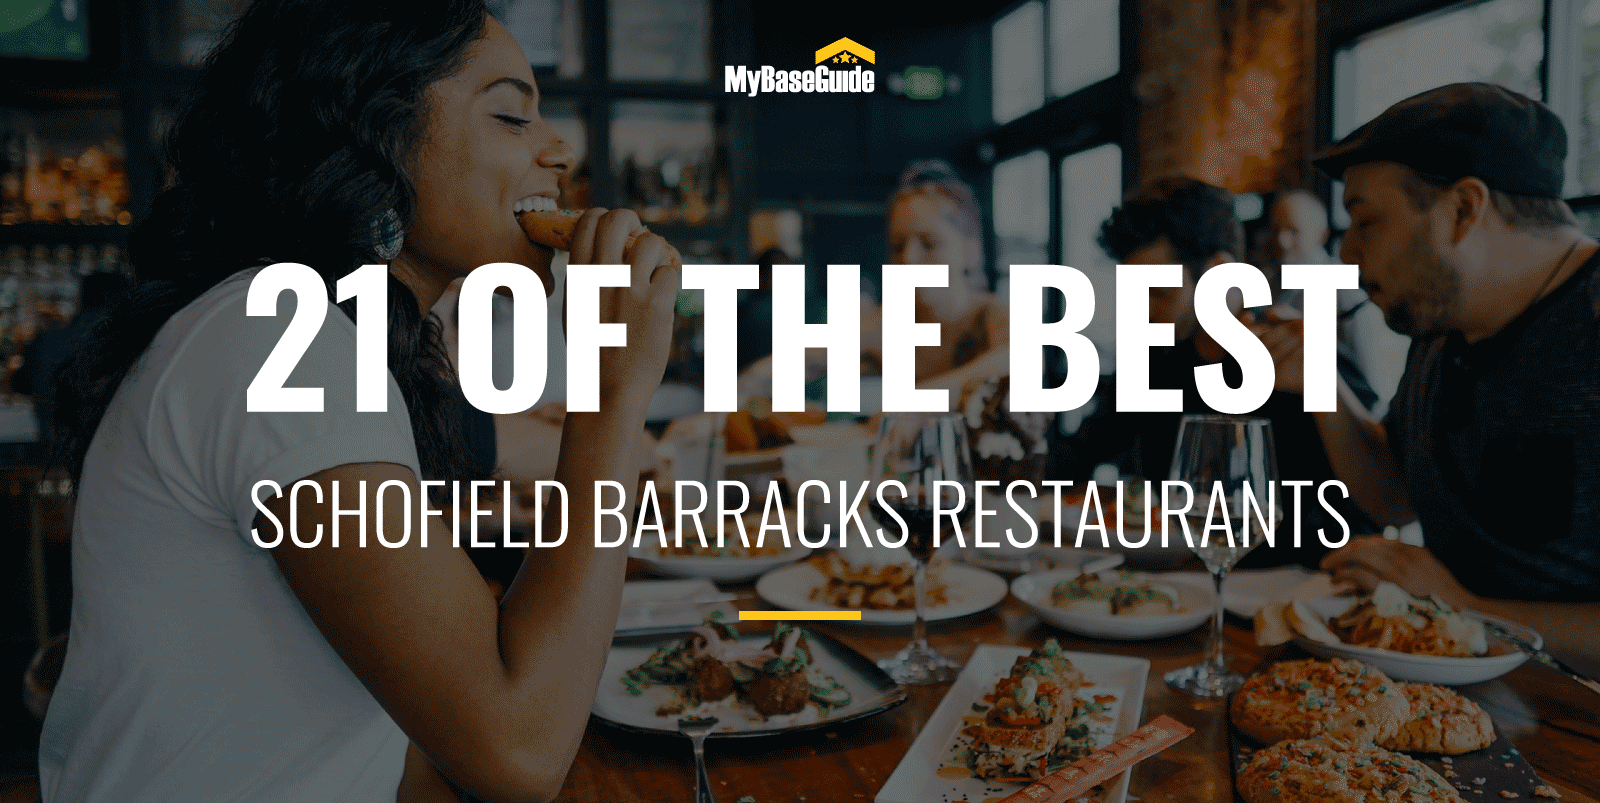 21 of the Best Restaurants Near Schofield Barracks